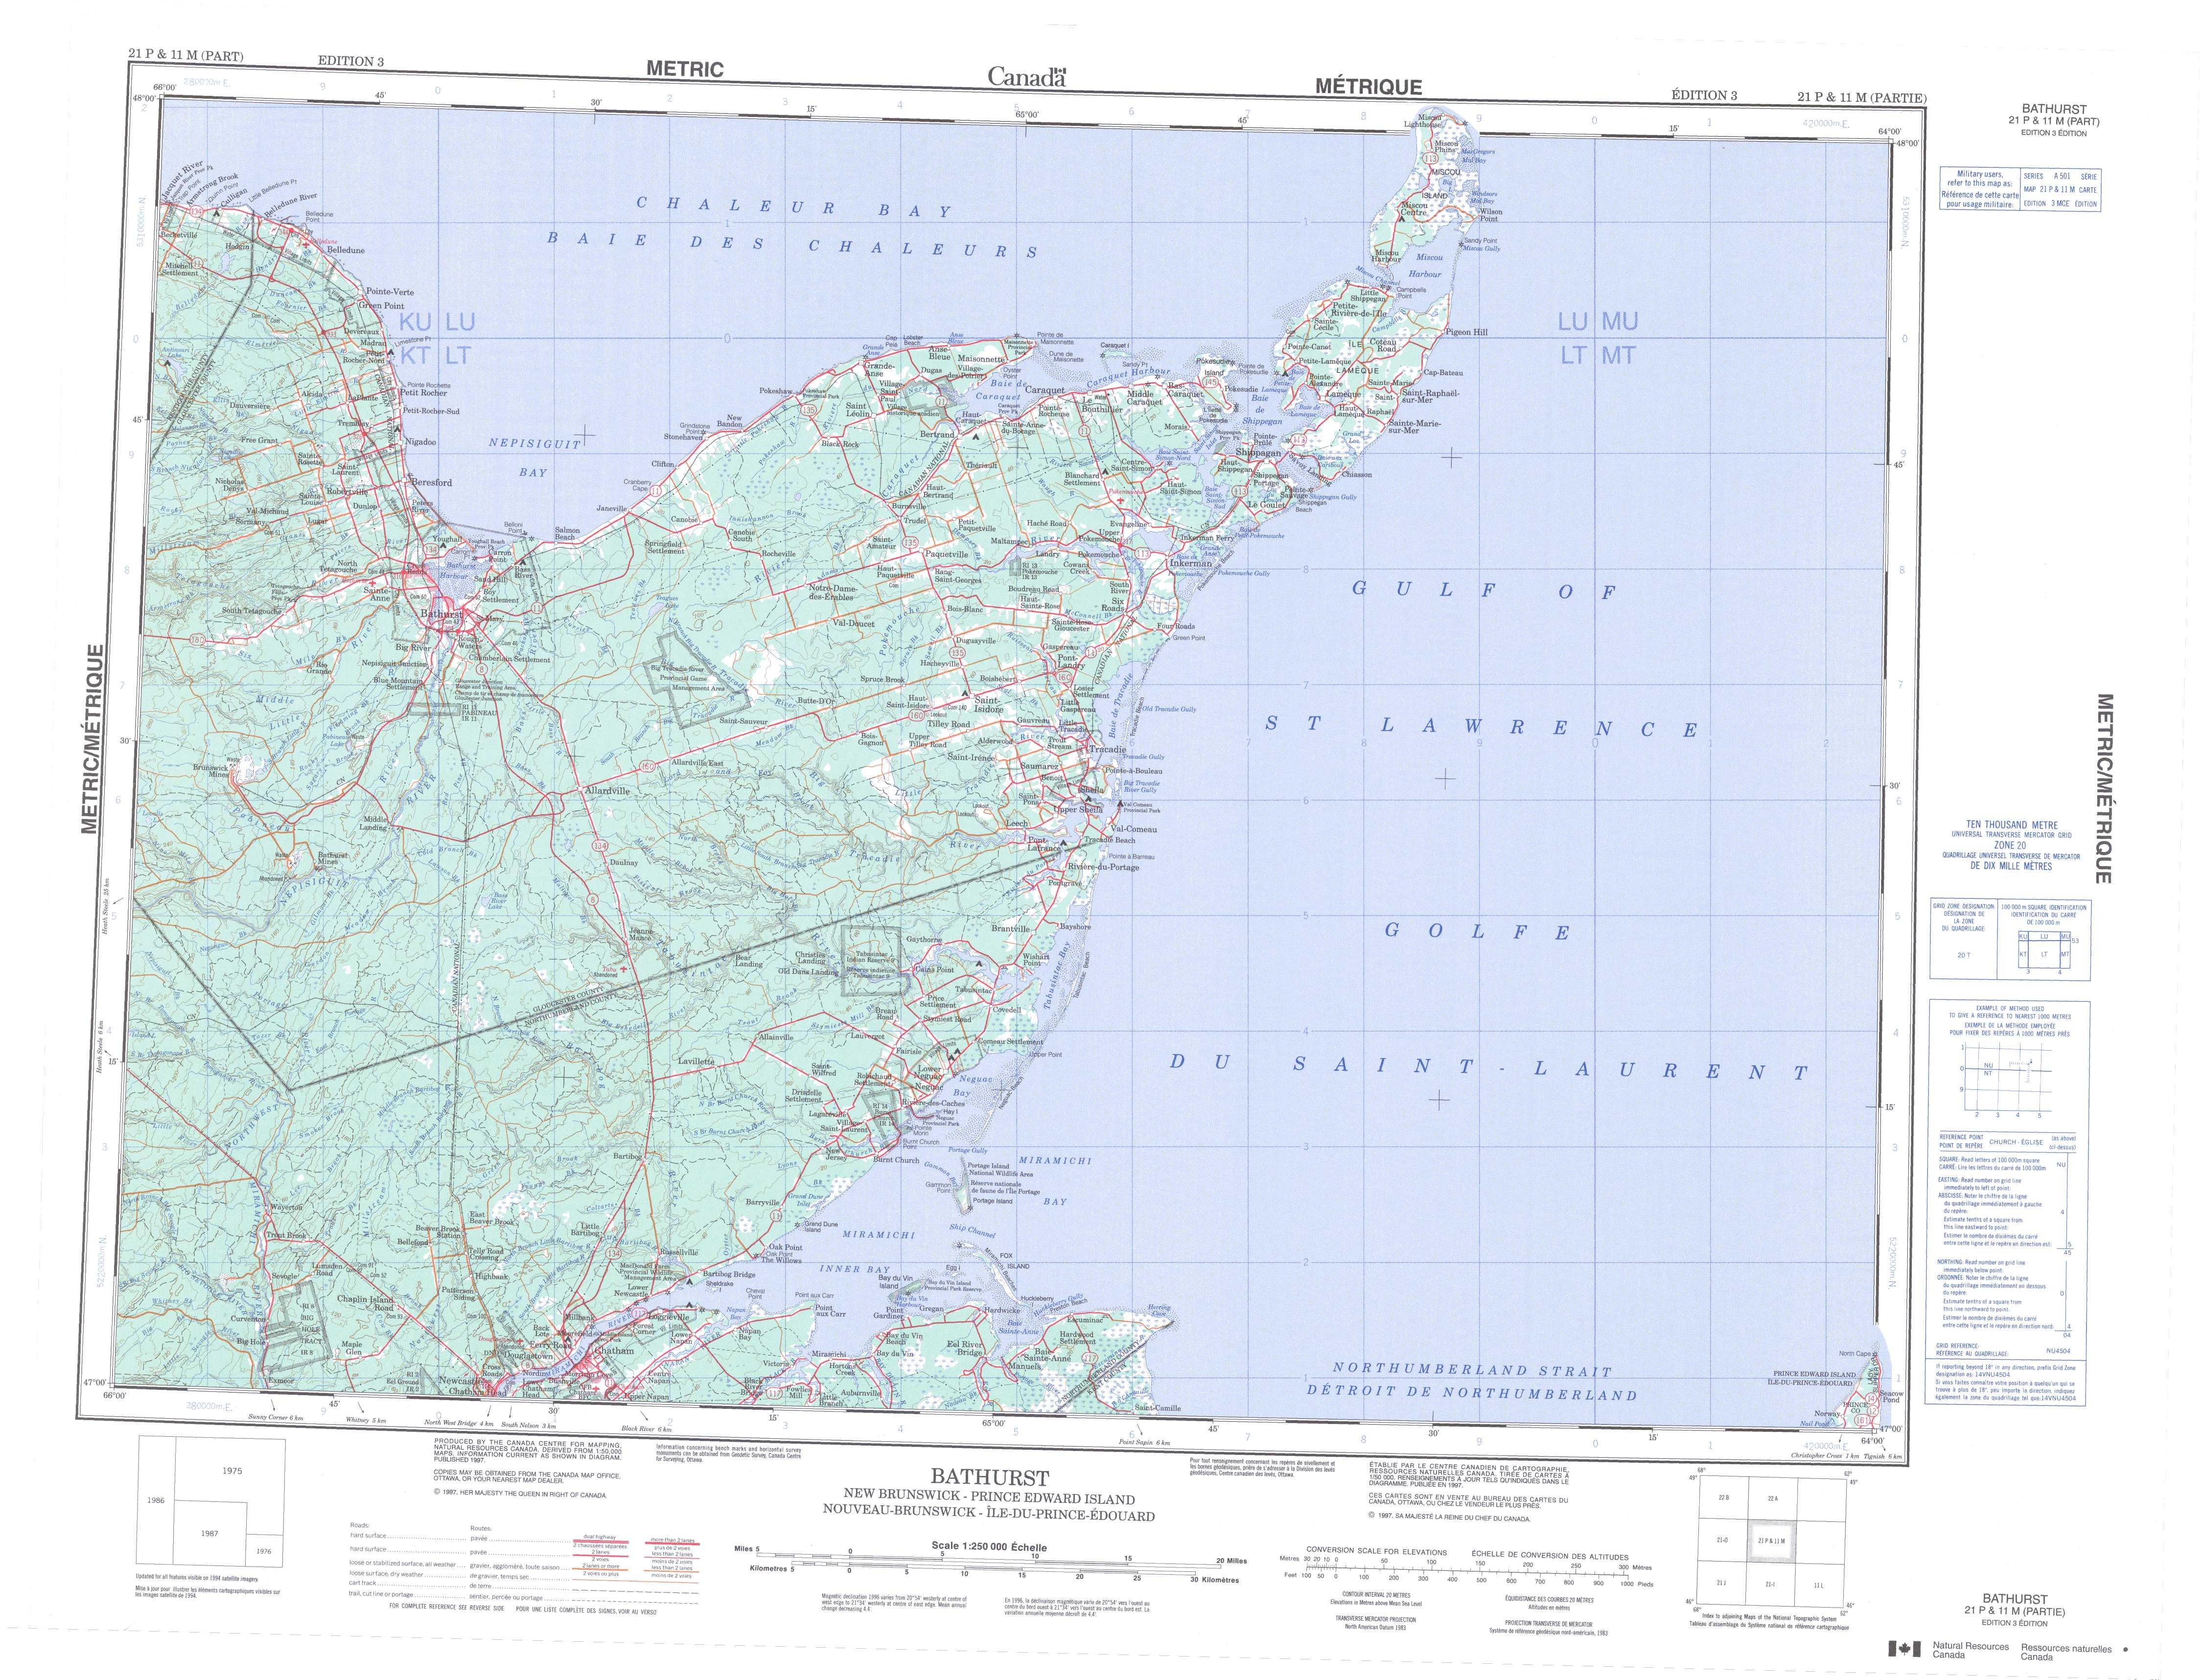 Printable Topographic Map of Bathurst 021P NB